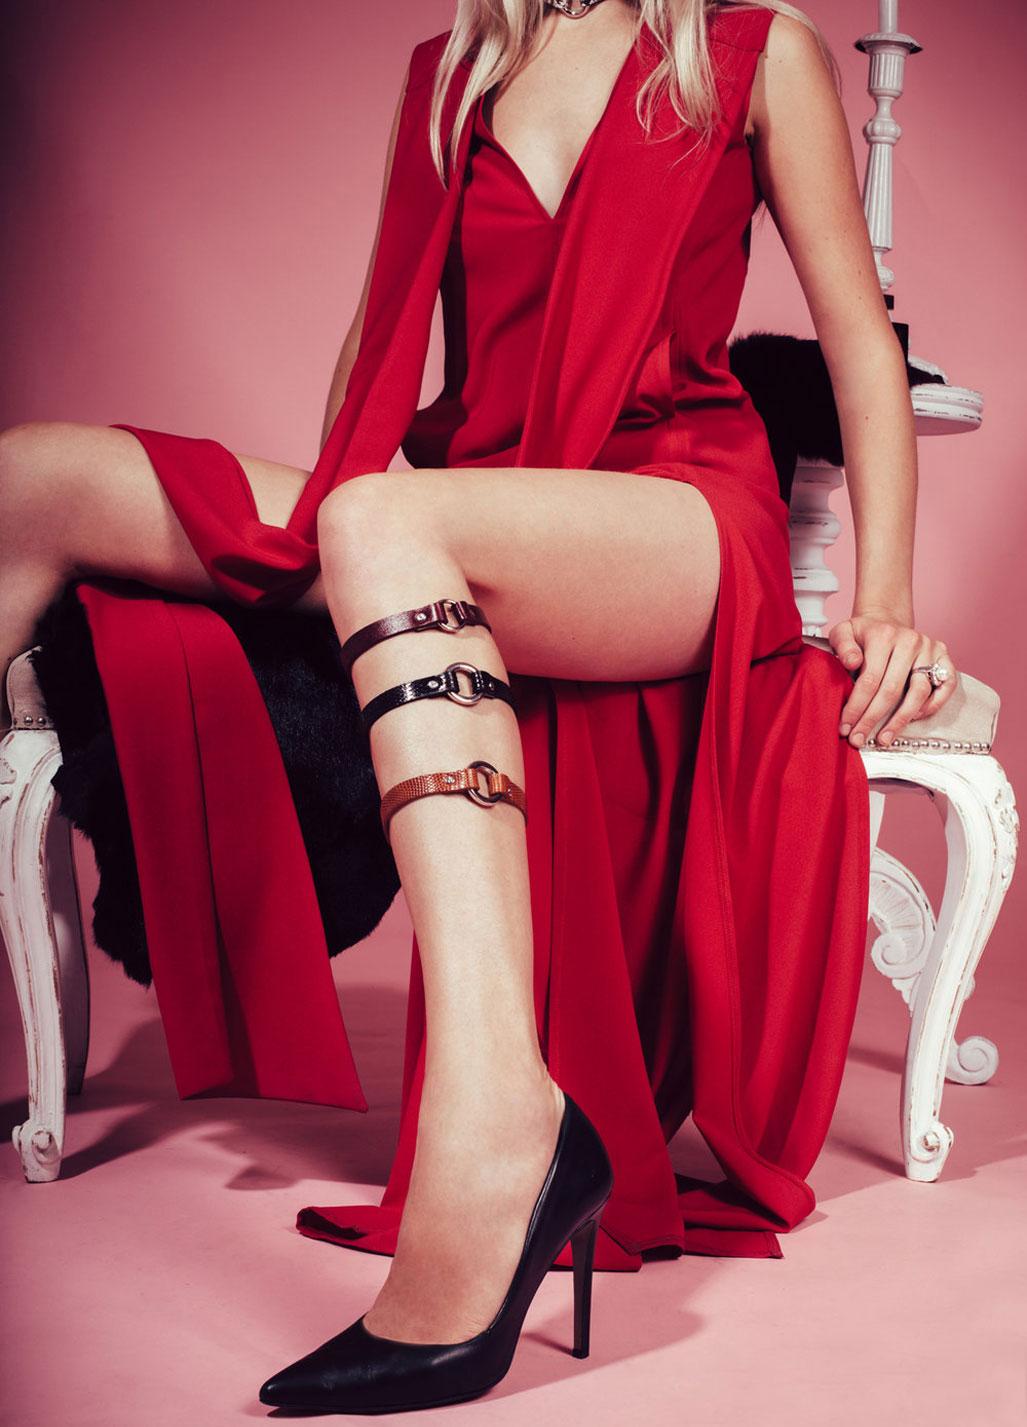 Светлана Легун в рекламной кампании Wicca collection 2016 / фото 06